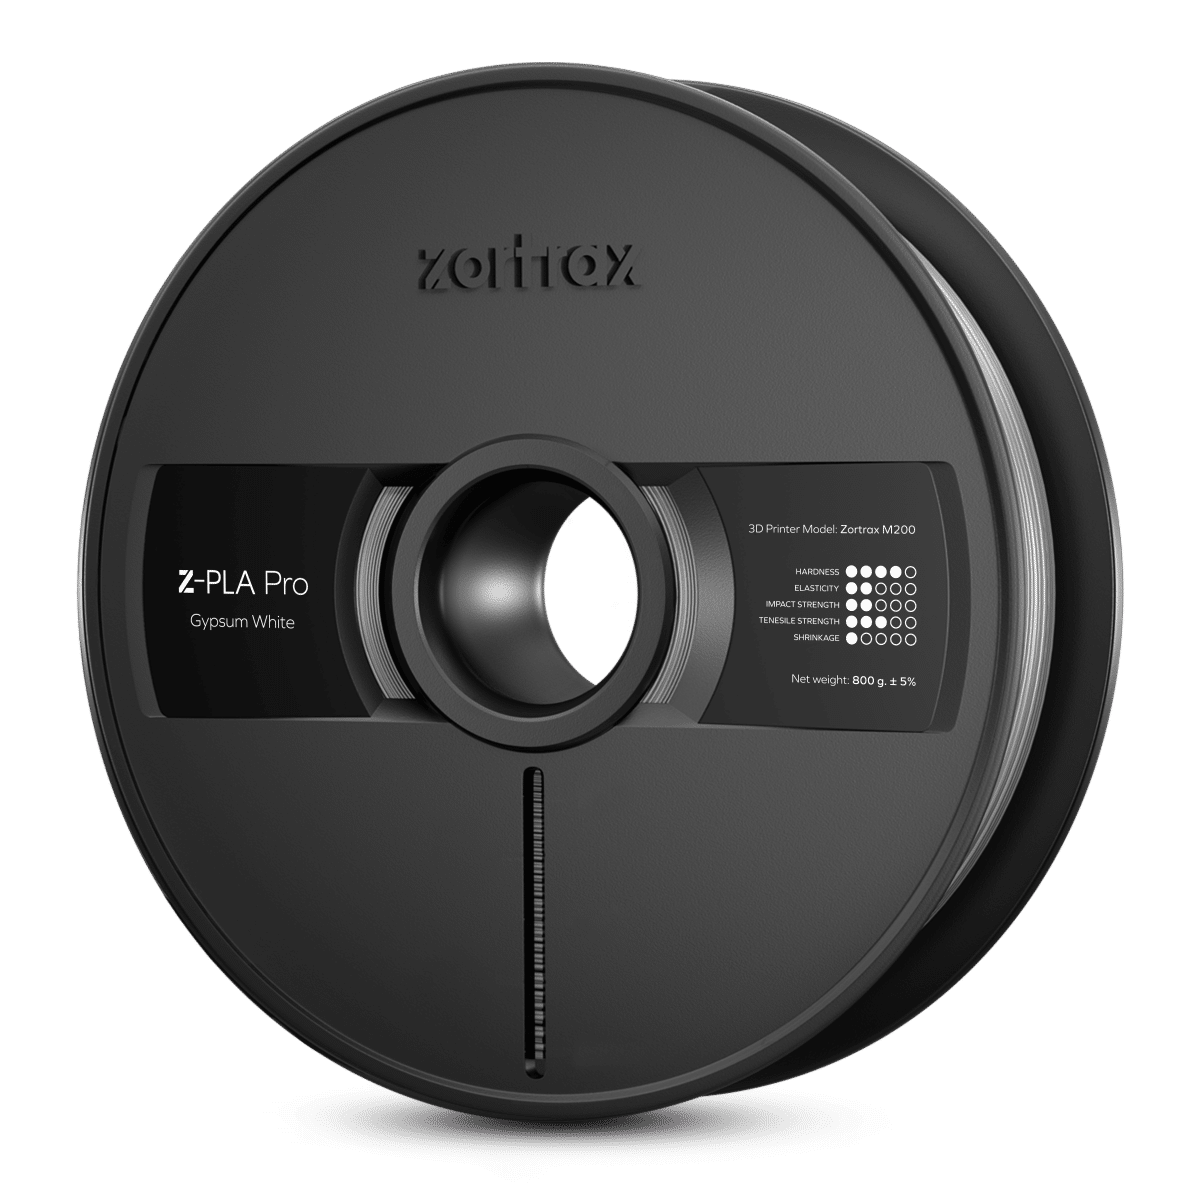 Billede af Zortrax Z-PLA Pro - 1,75mm - 800g - Gypsum White